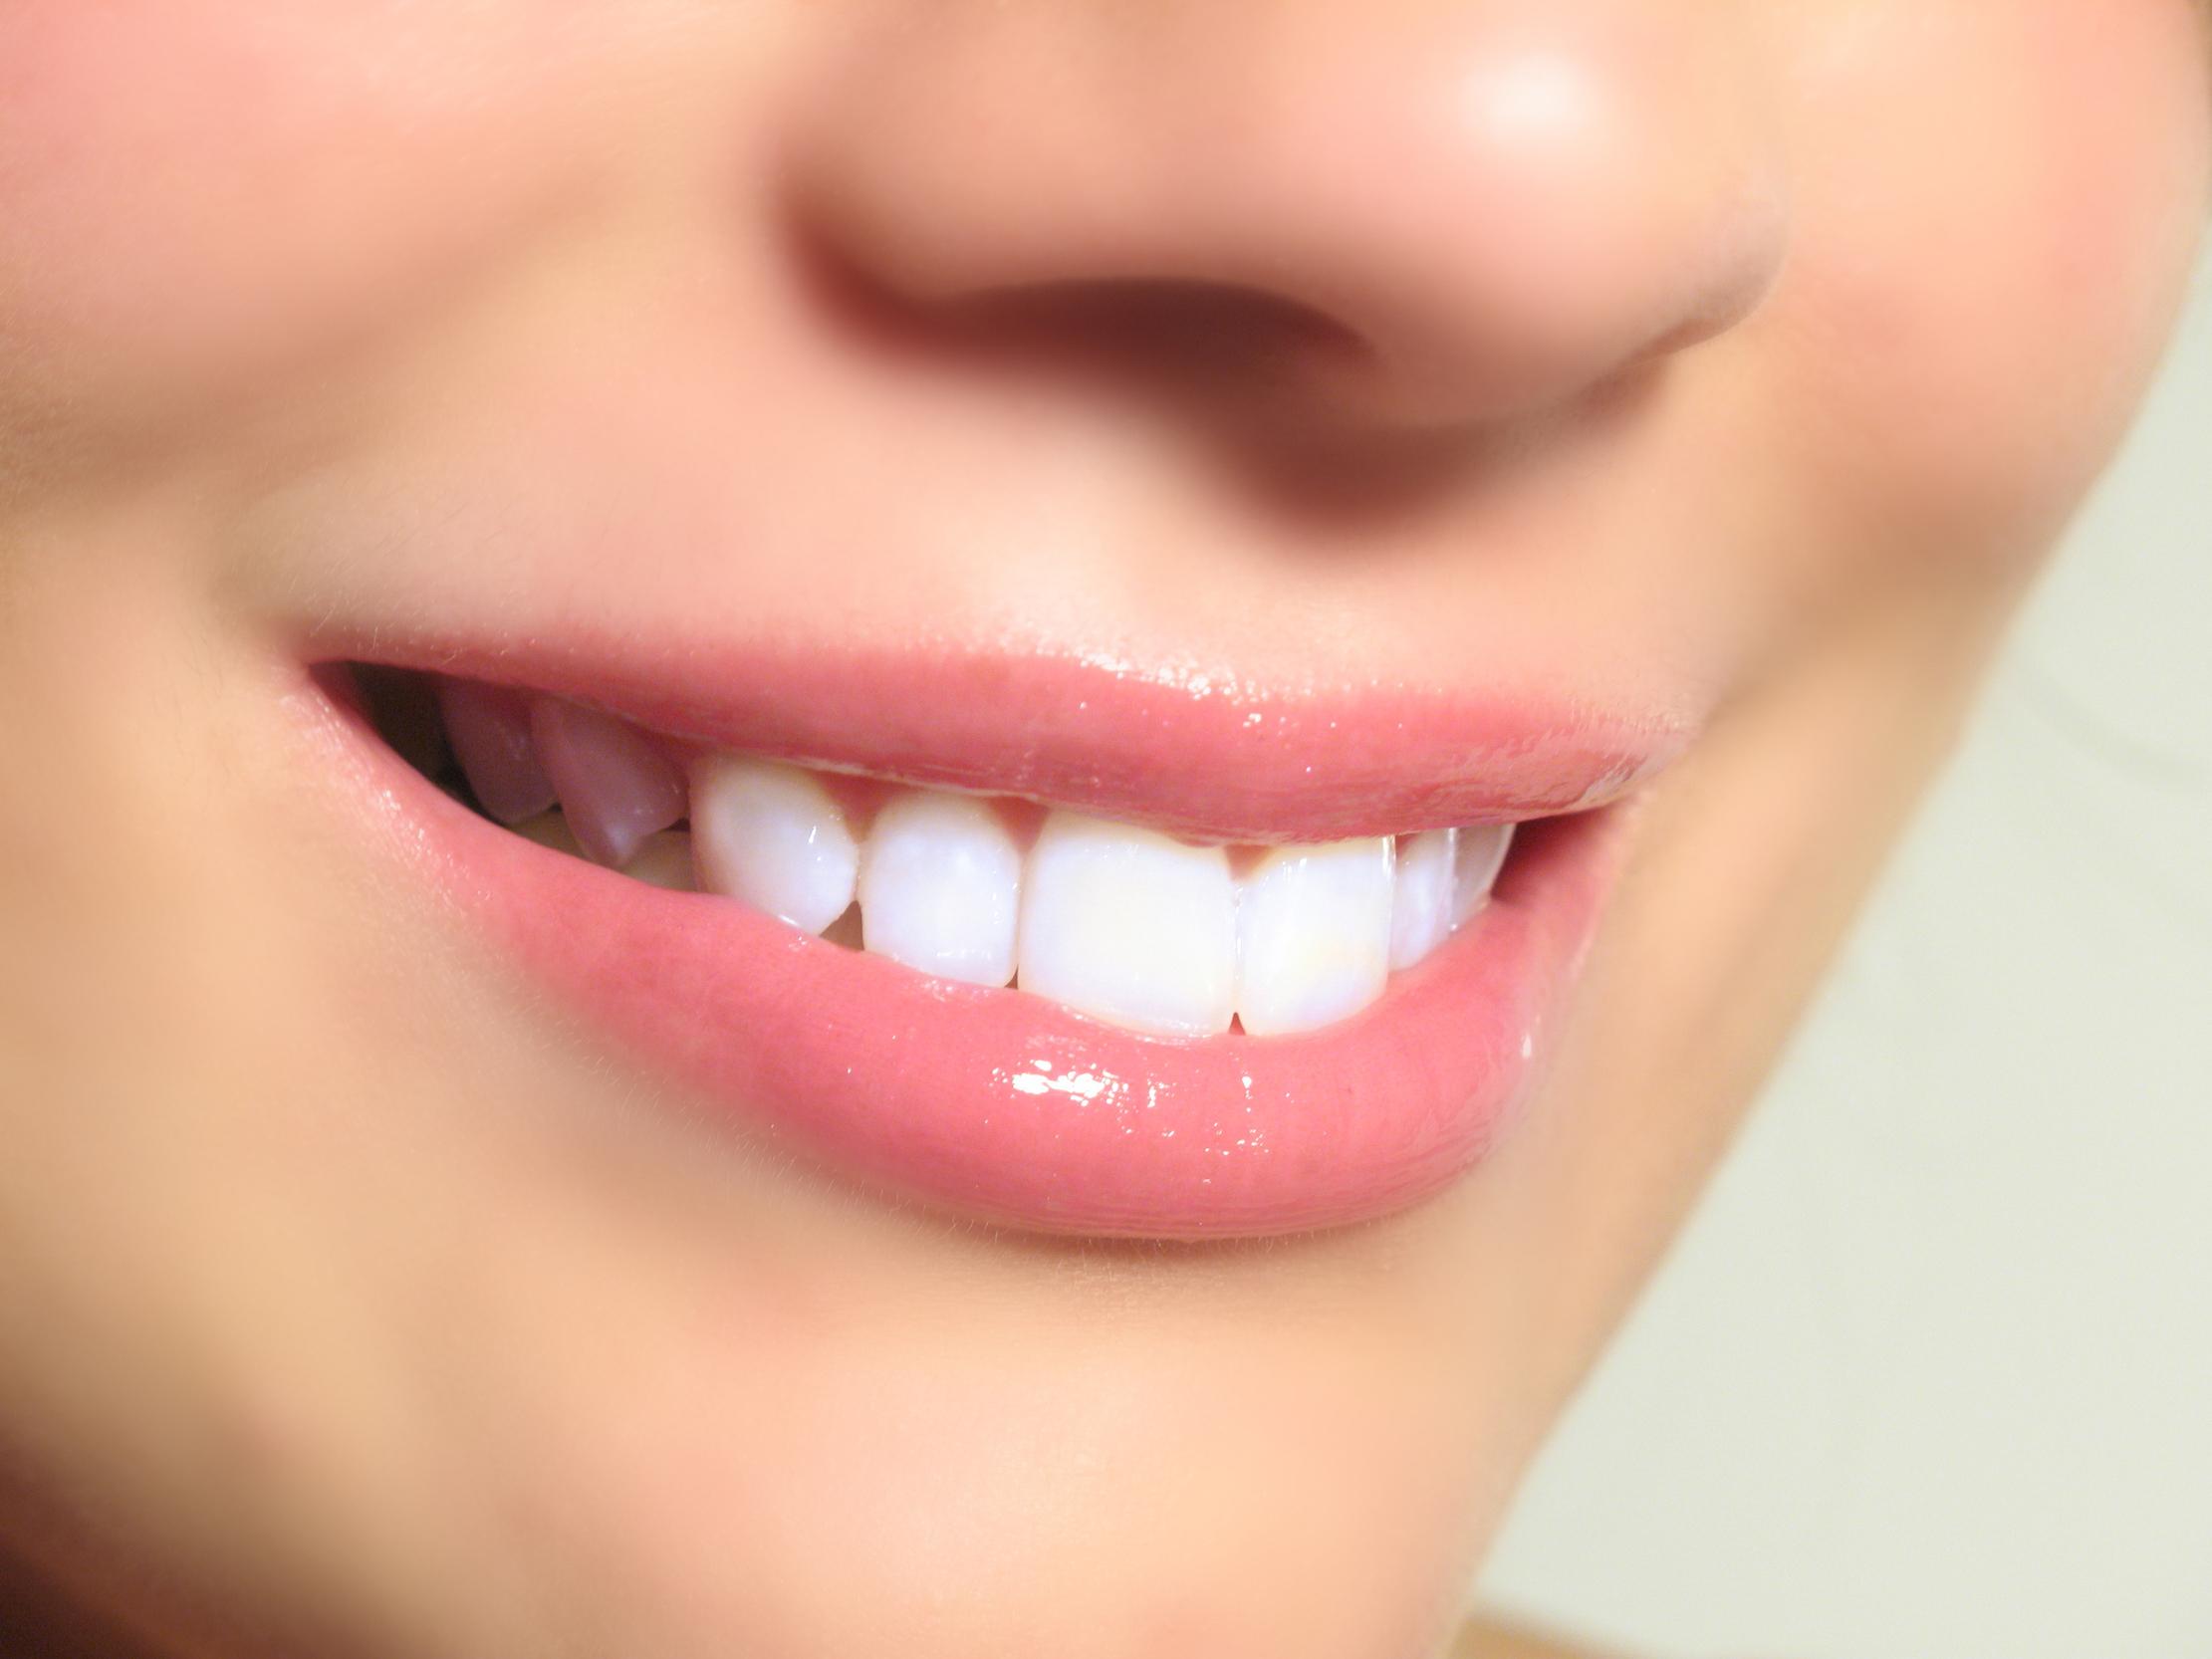 صور موضوع عن الاسنان قصير